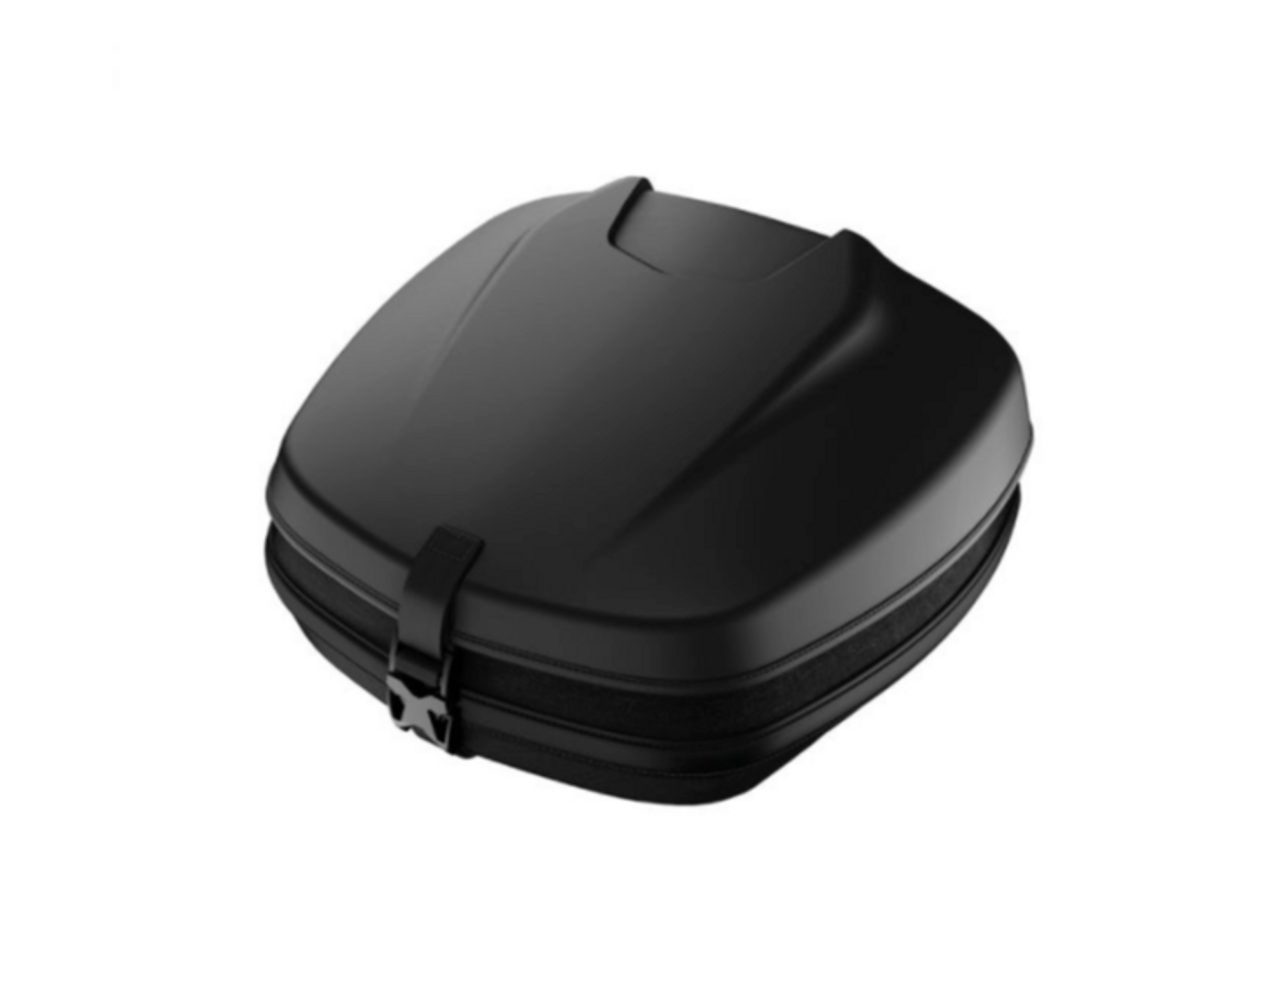 LinQ Top Case for the Can Am Ryker - Black (BRP-219400764) Lamonster Garage / lamonstergarage.com